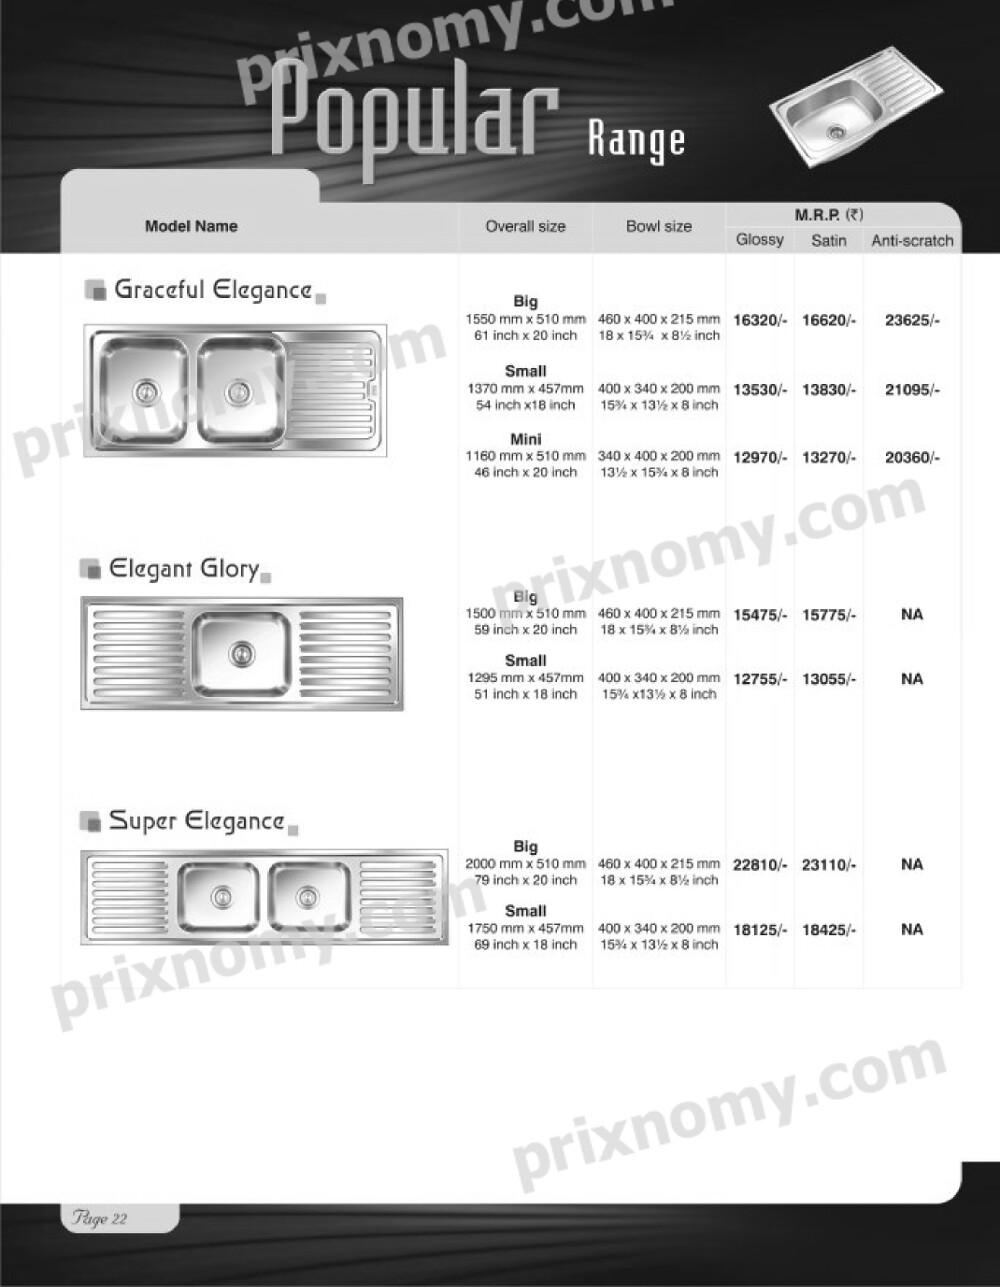 Nirali Kitchen Sinks price List 2014 | Prixnomy